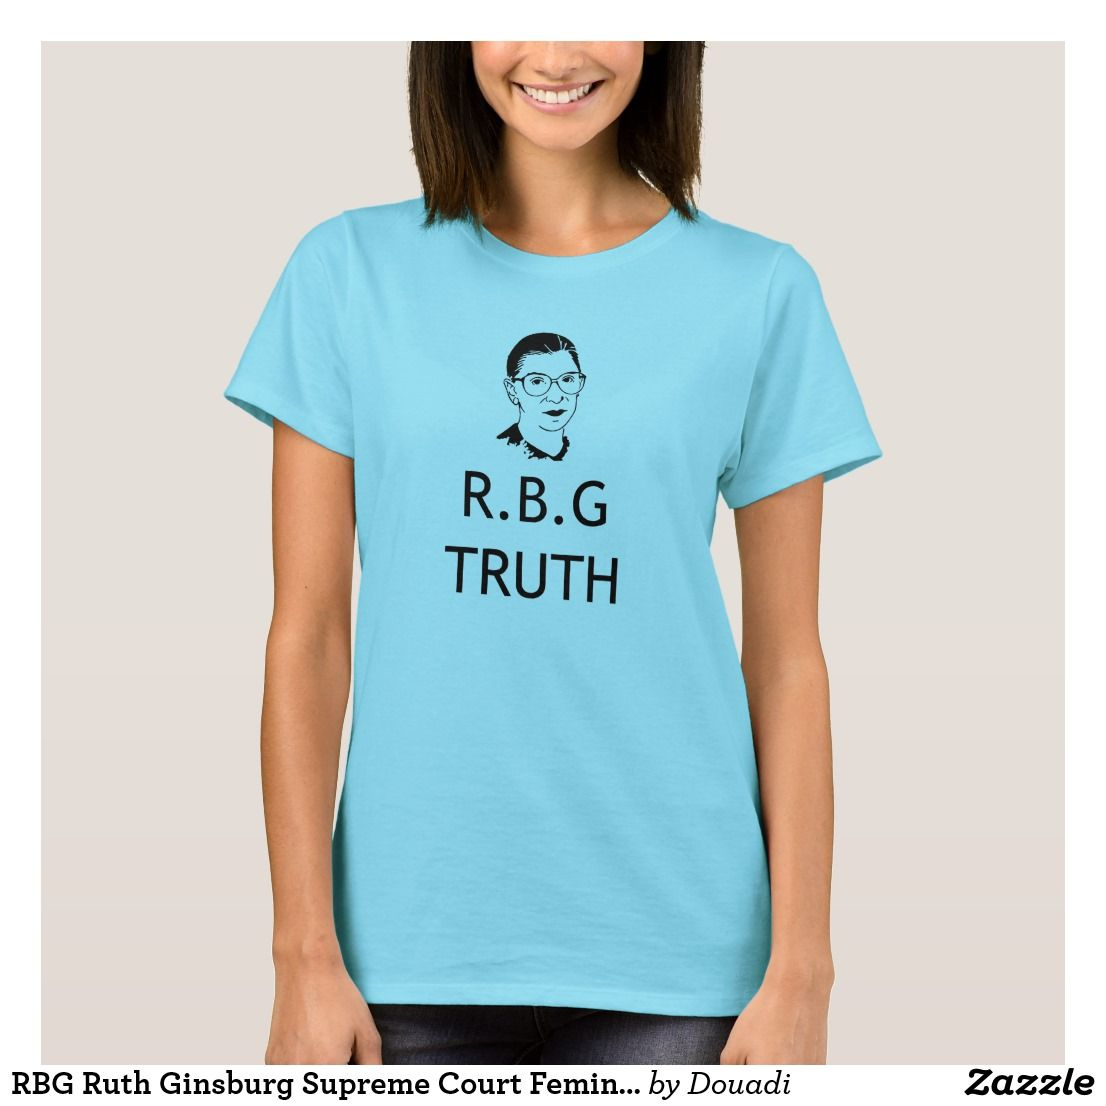 70440477a404 RBG Ruth Ginsburg Supreme Court Feminist Political T-Shirt | Zazzle ...